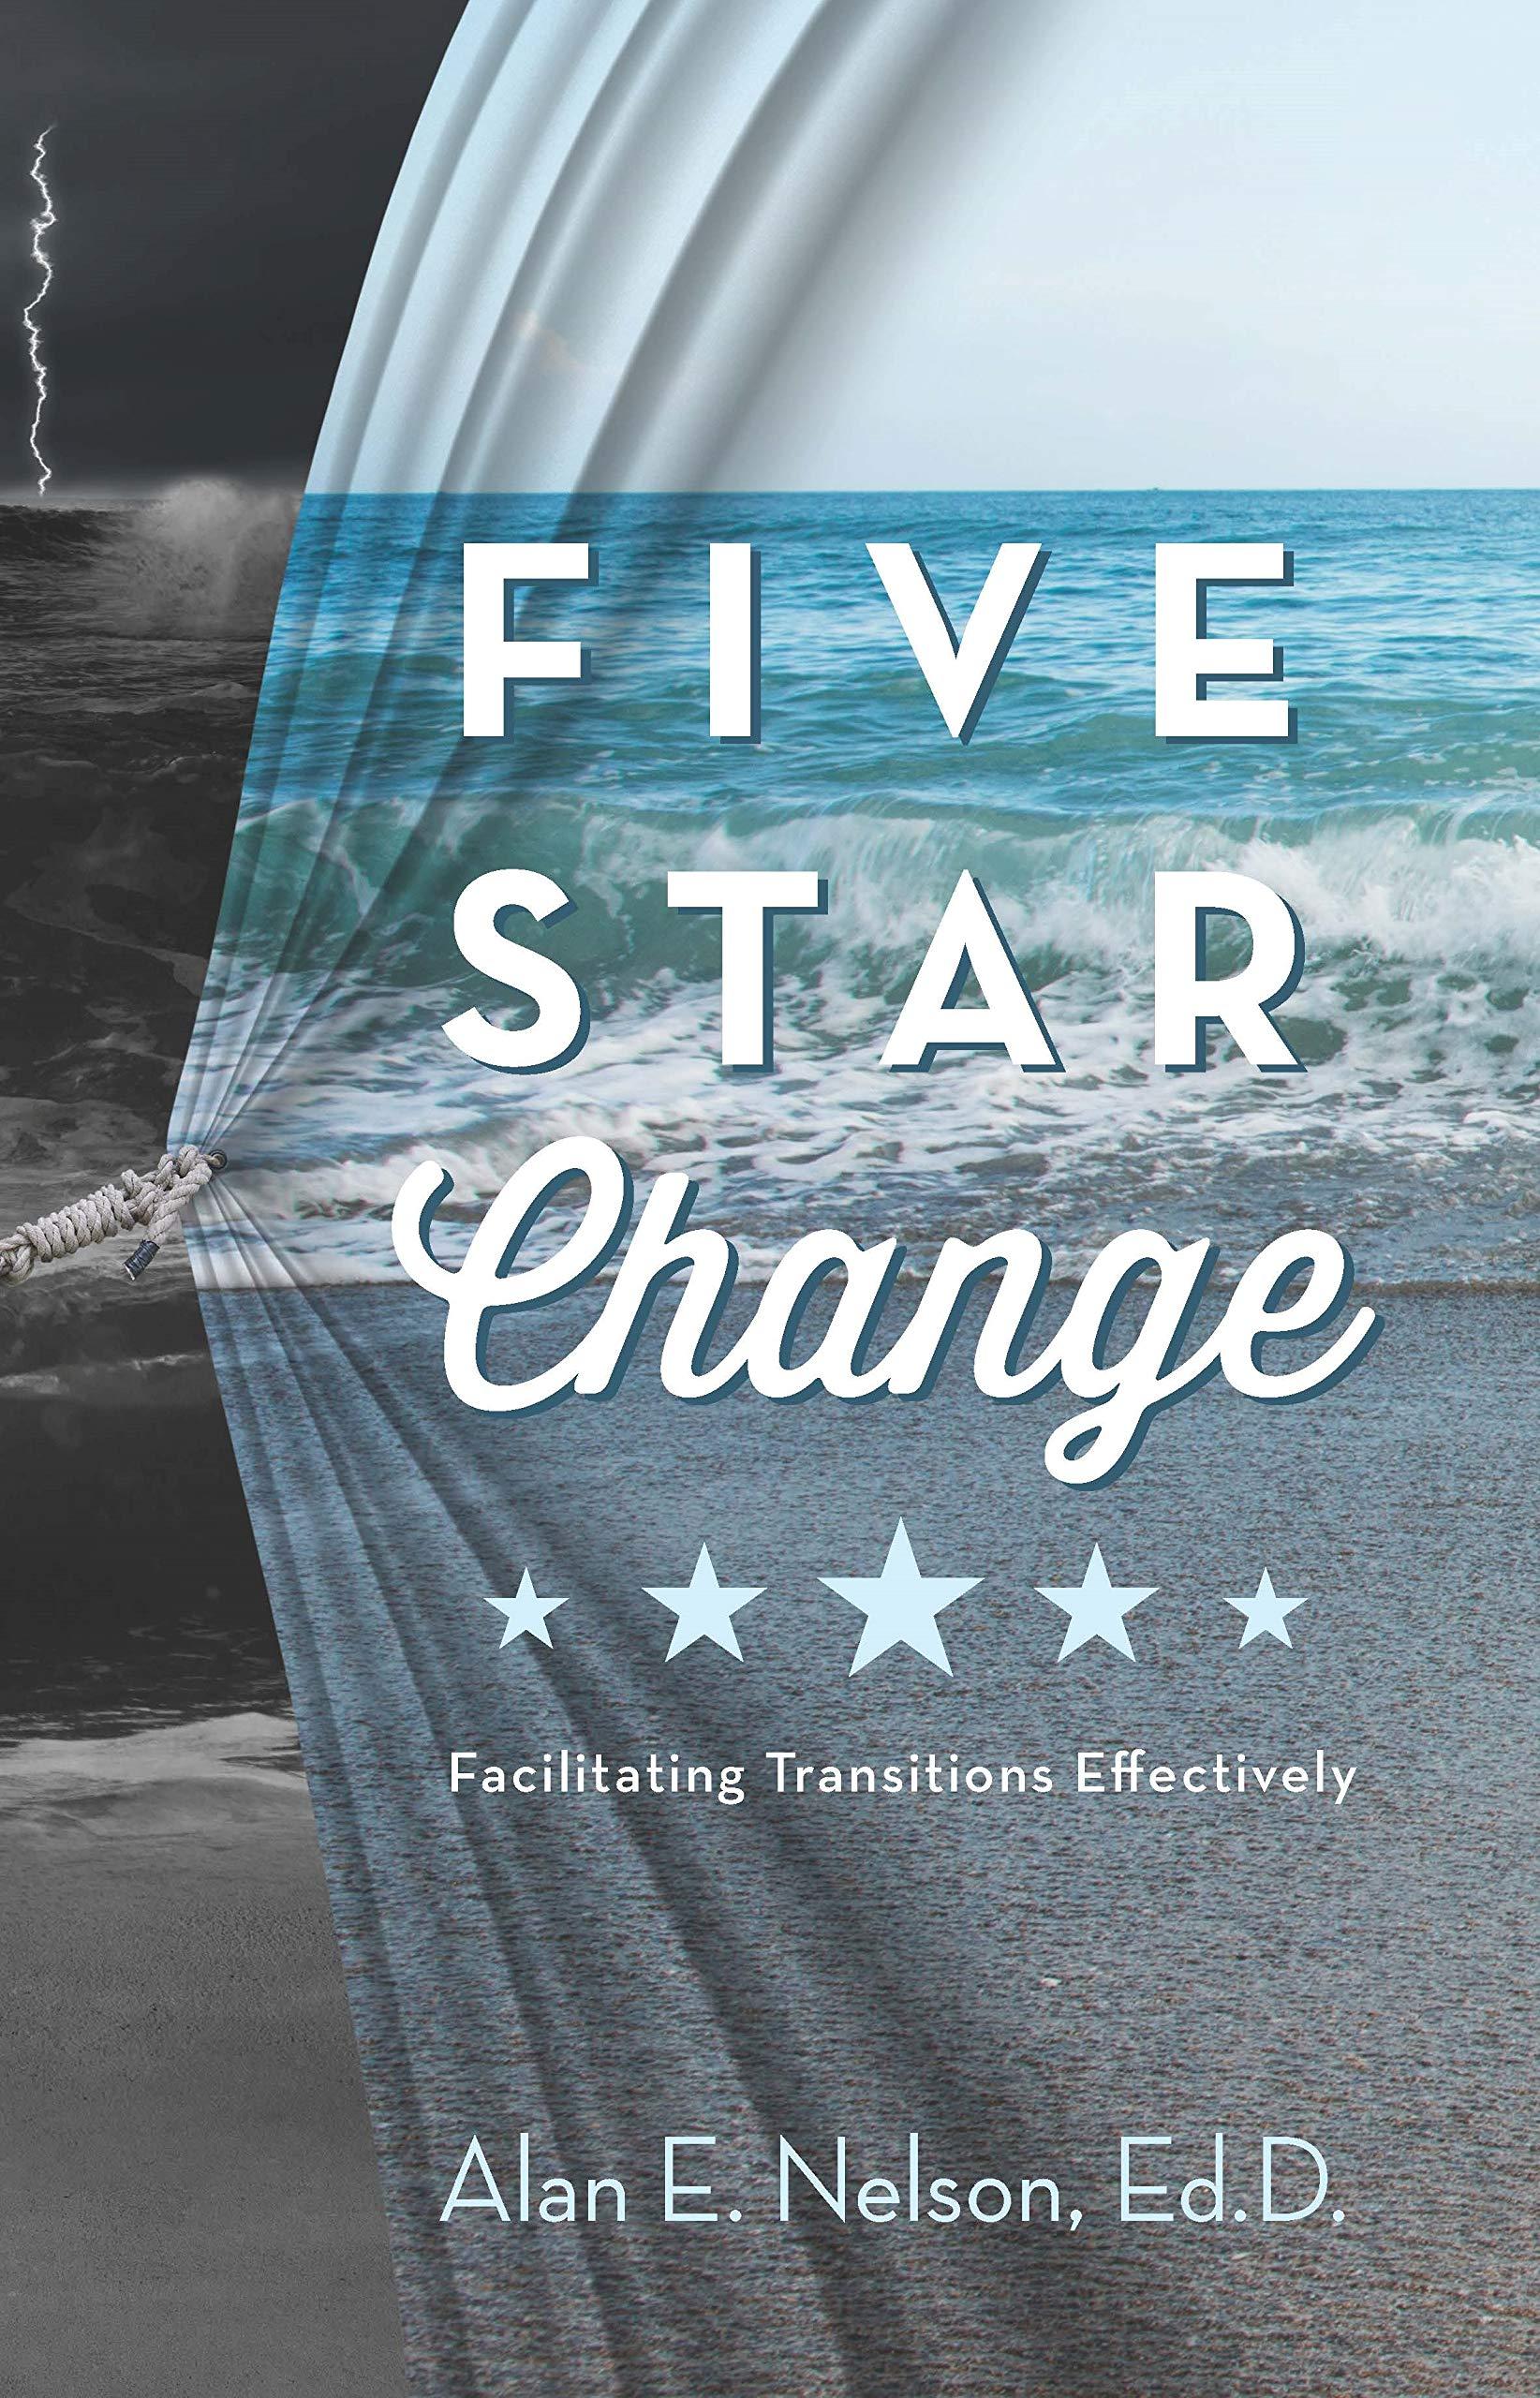 Five-Star Change